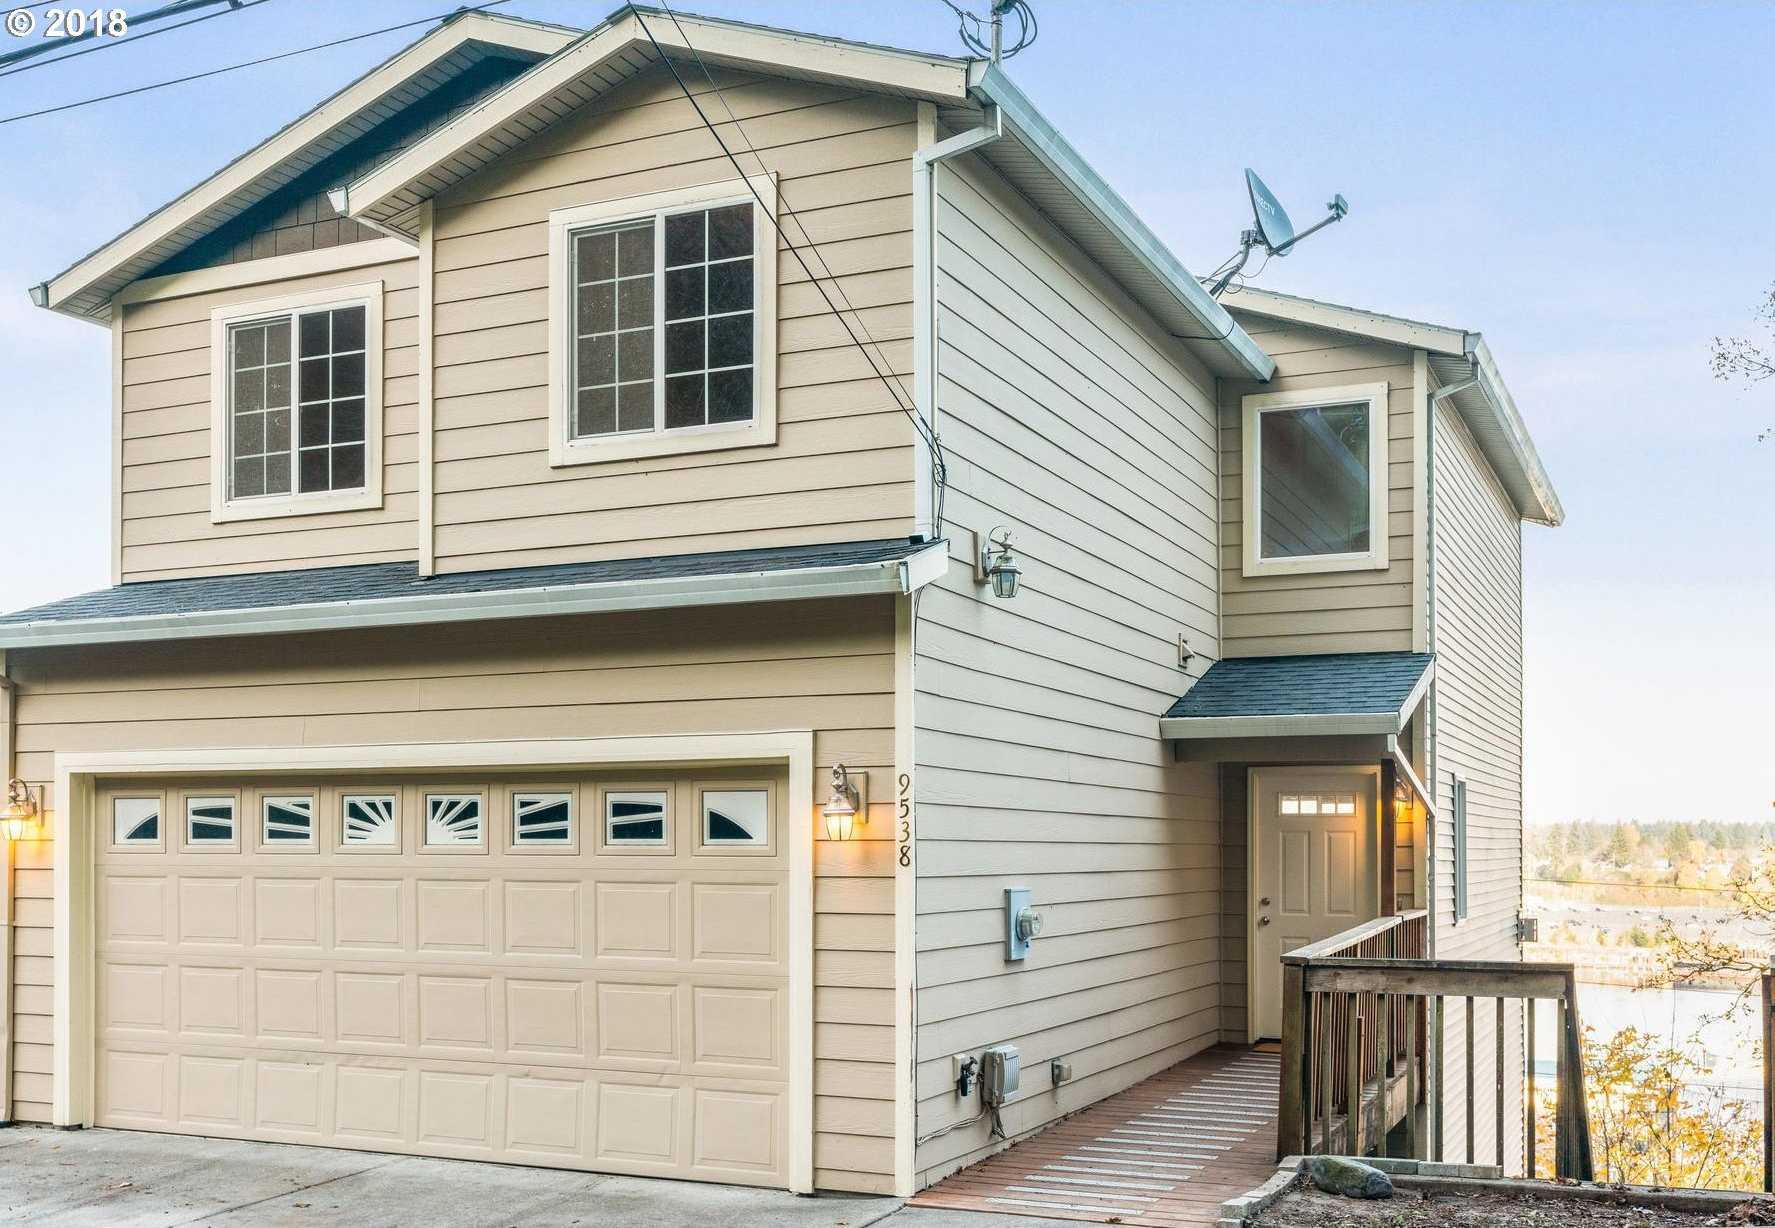 $475,000 - 4Br/3Ba -  for Sale in Linnton, Portland